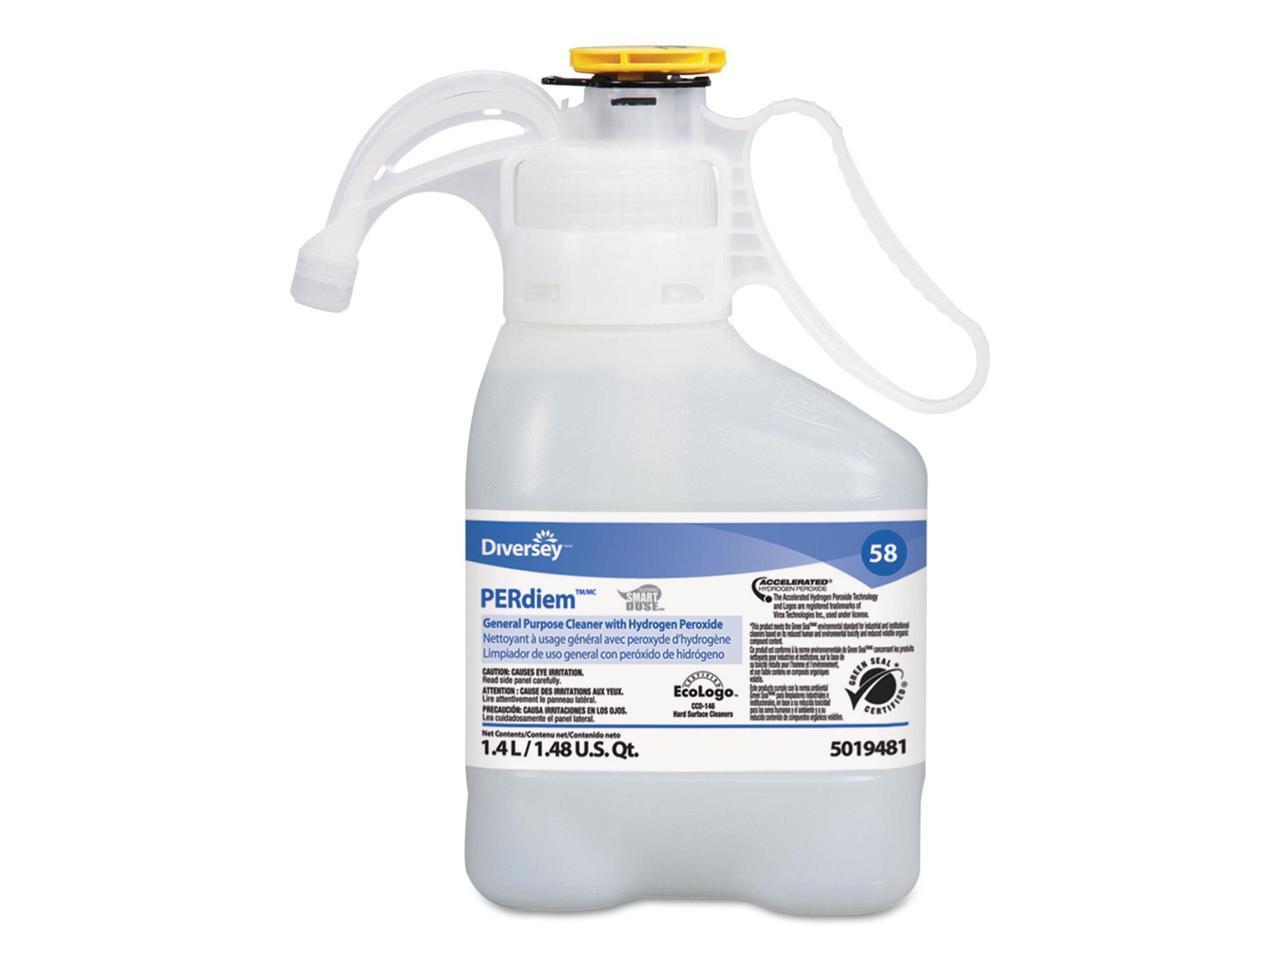 Diversey General Purpose Cleaner 2 BT/CT 70658411176 | eBay